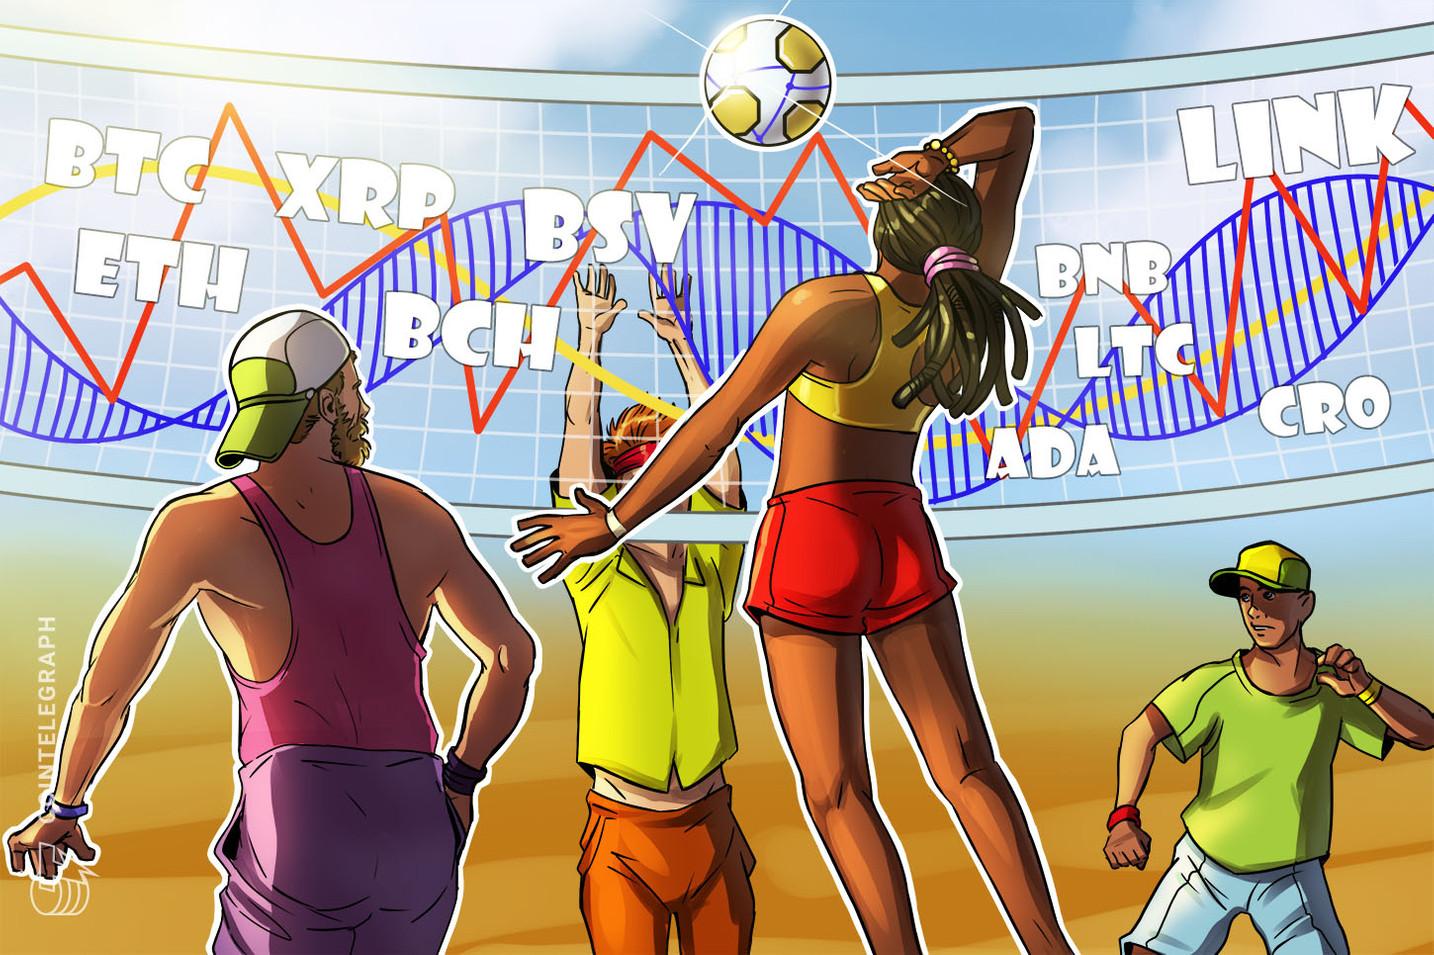 Price Analysis 7/20: BTC, ETH, XRP, BCH, BSV, ADA, LTC, BNB, LINK, CRO